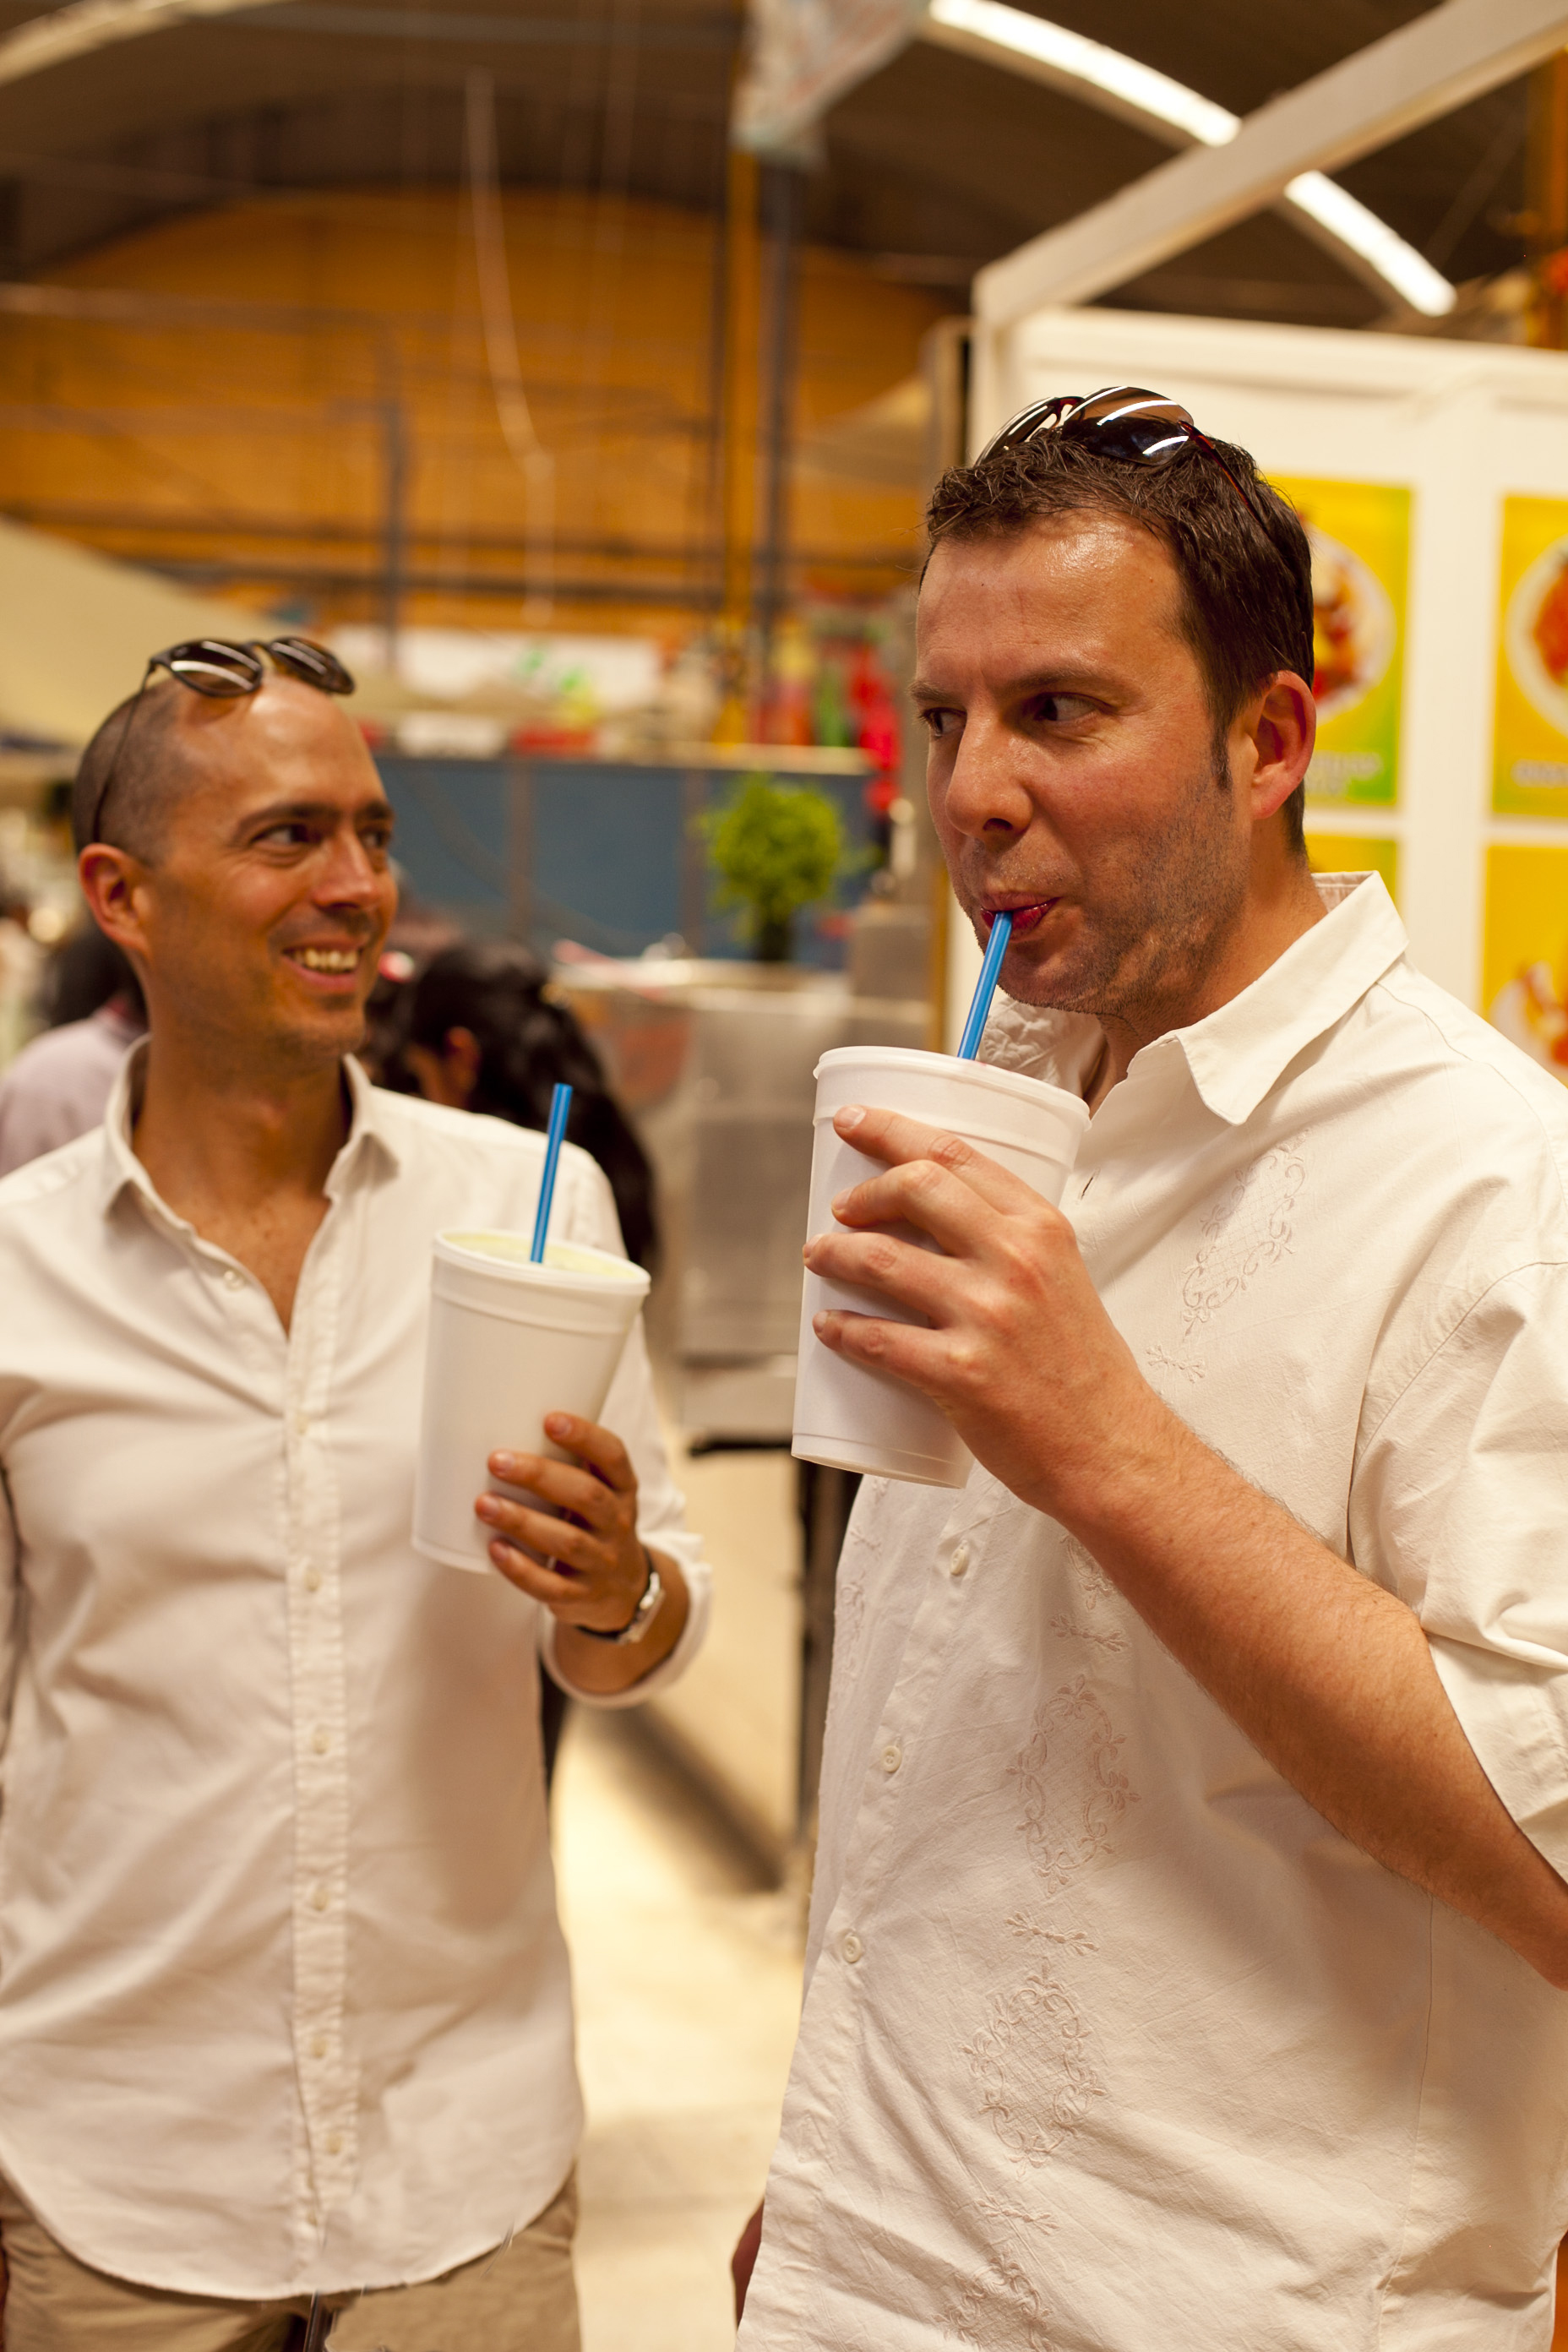 men drinking fresh juice at a Mexico City market